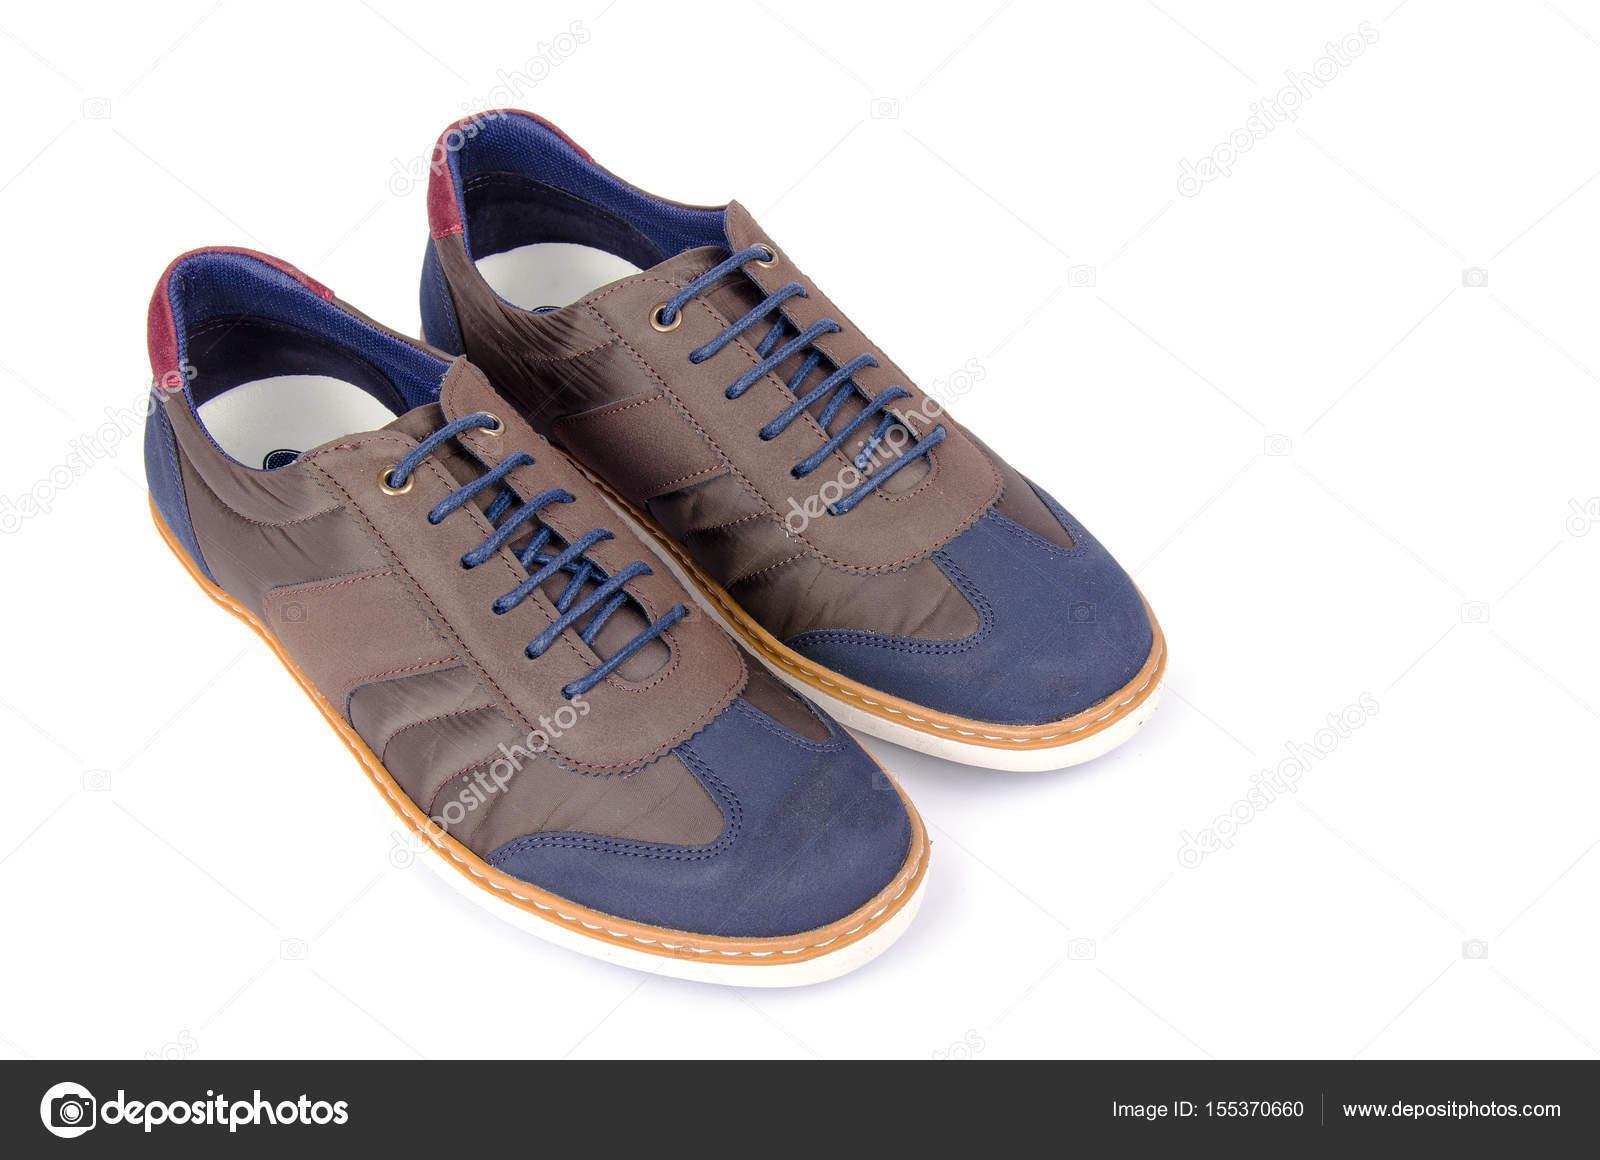 Braune Mann Sneakers isoliert auf weiss — Stockfoto © Nasimi  155370660 82f2889b57